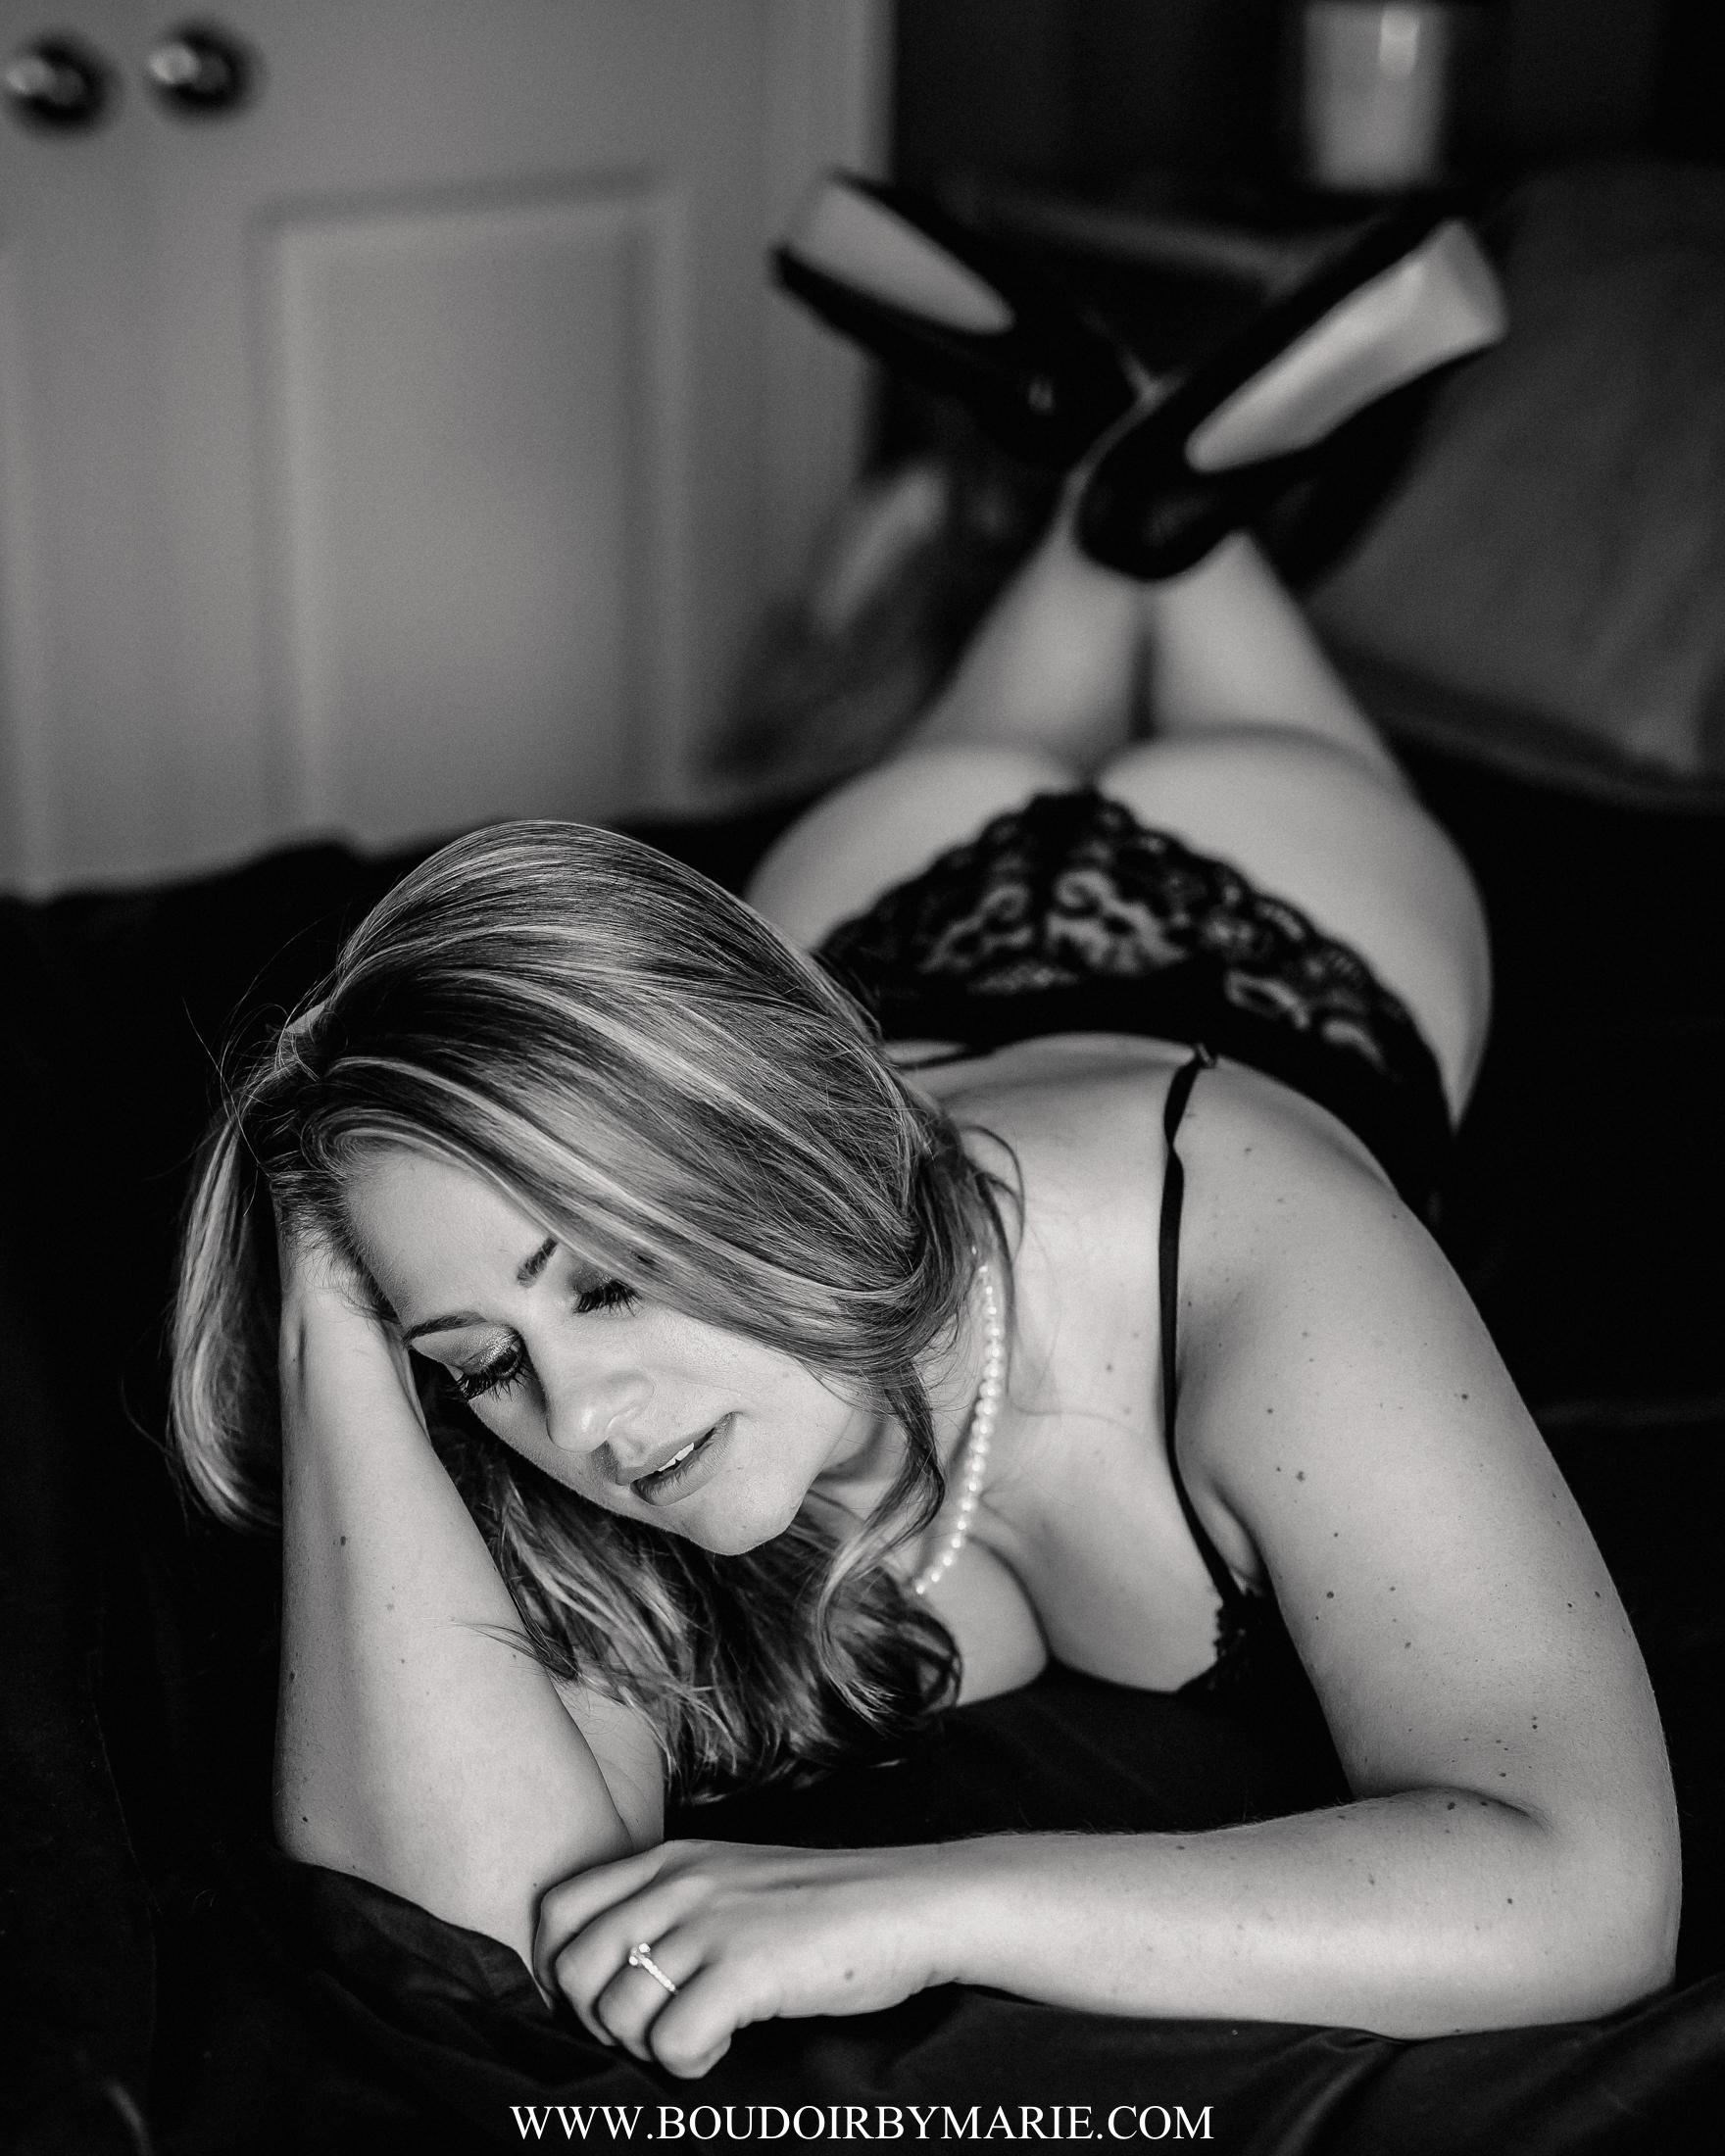 BoudoirbyMarie-Photography-15.jpg